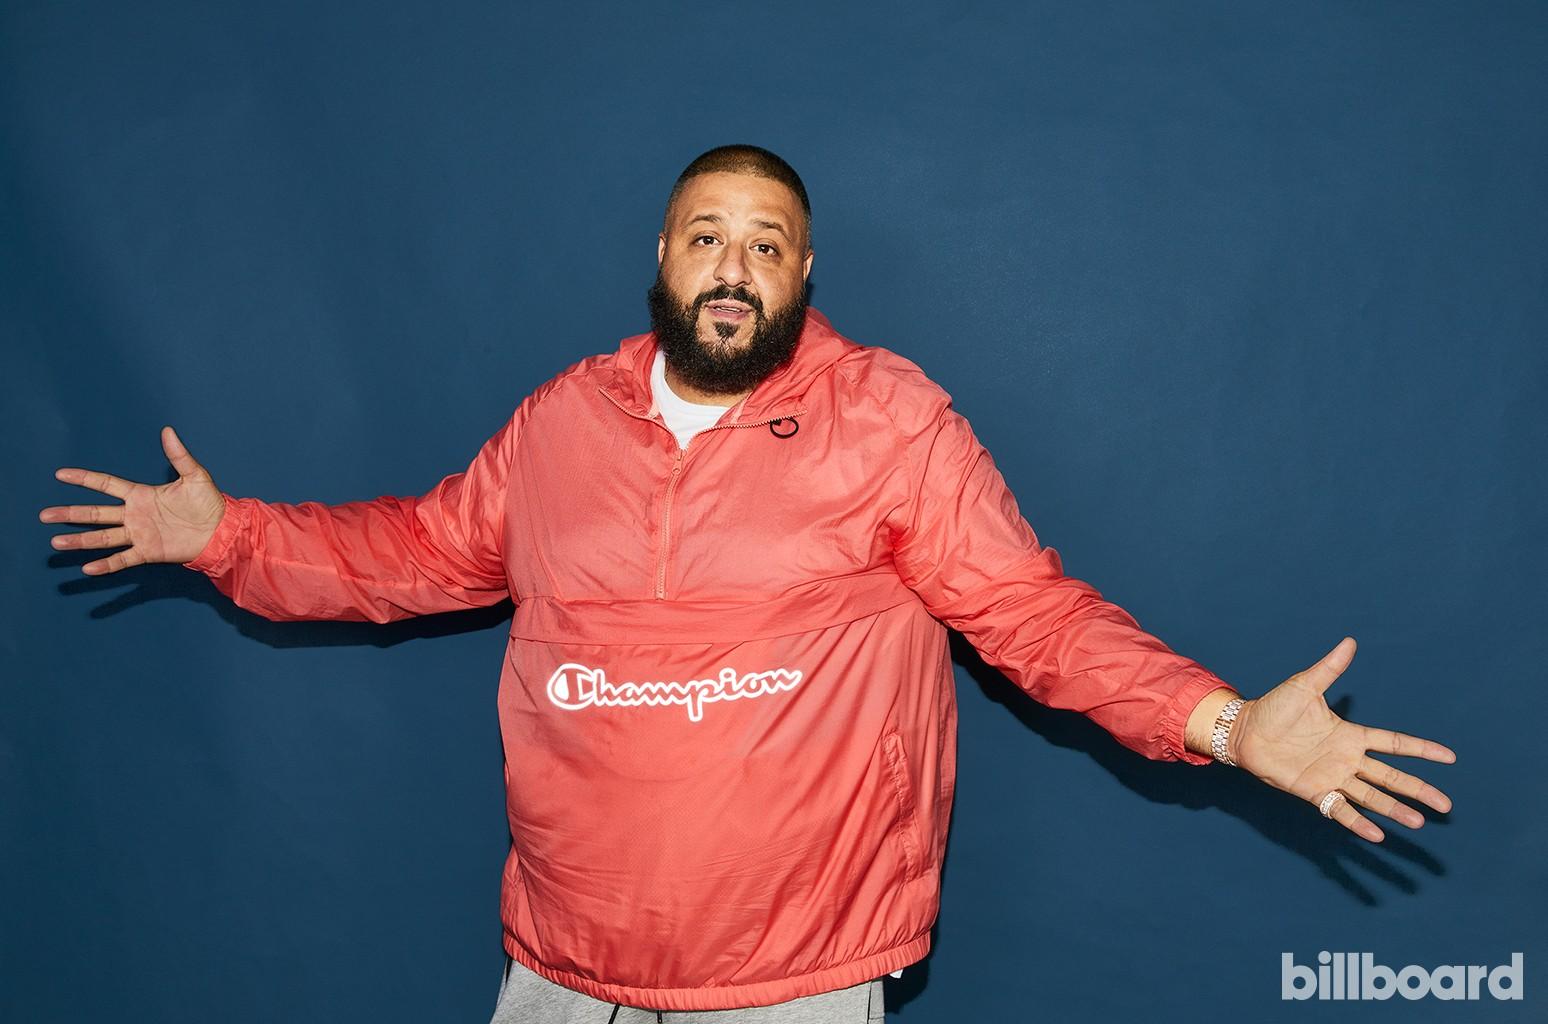 DJ Khaled at the Hot 100 Music Festival, 2017